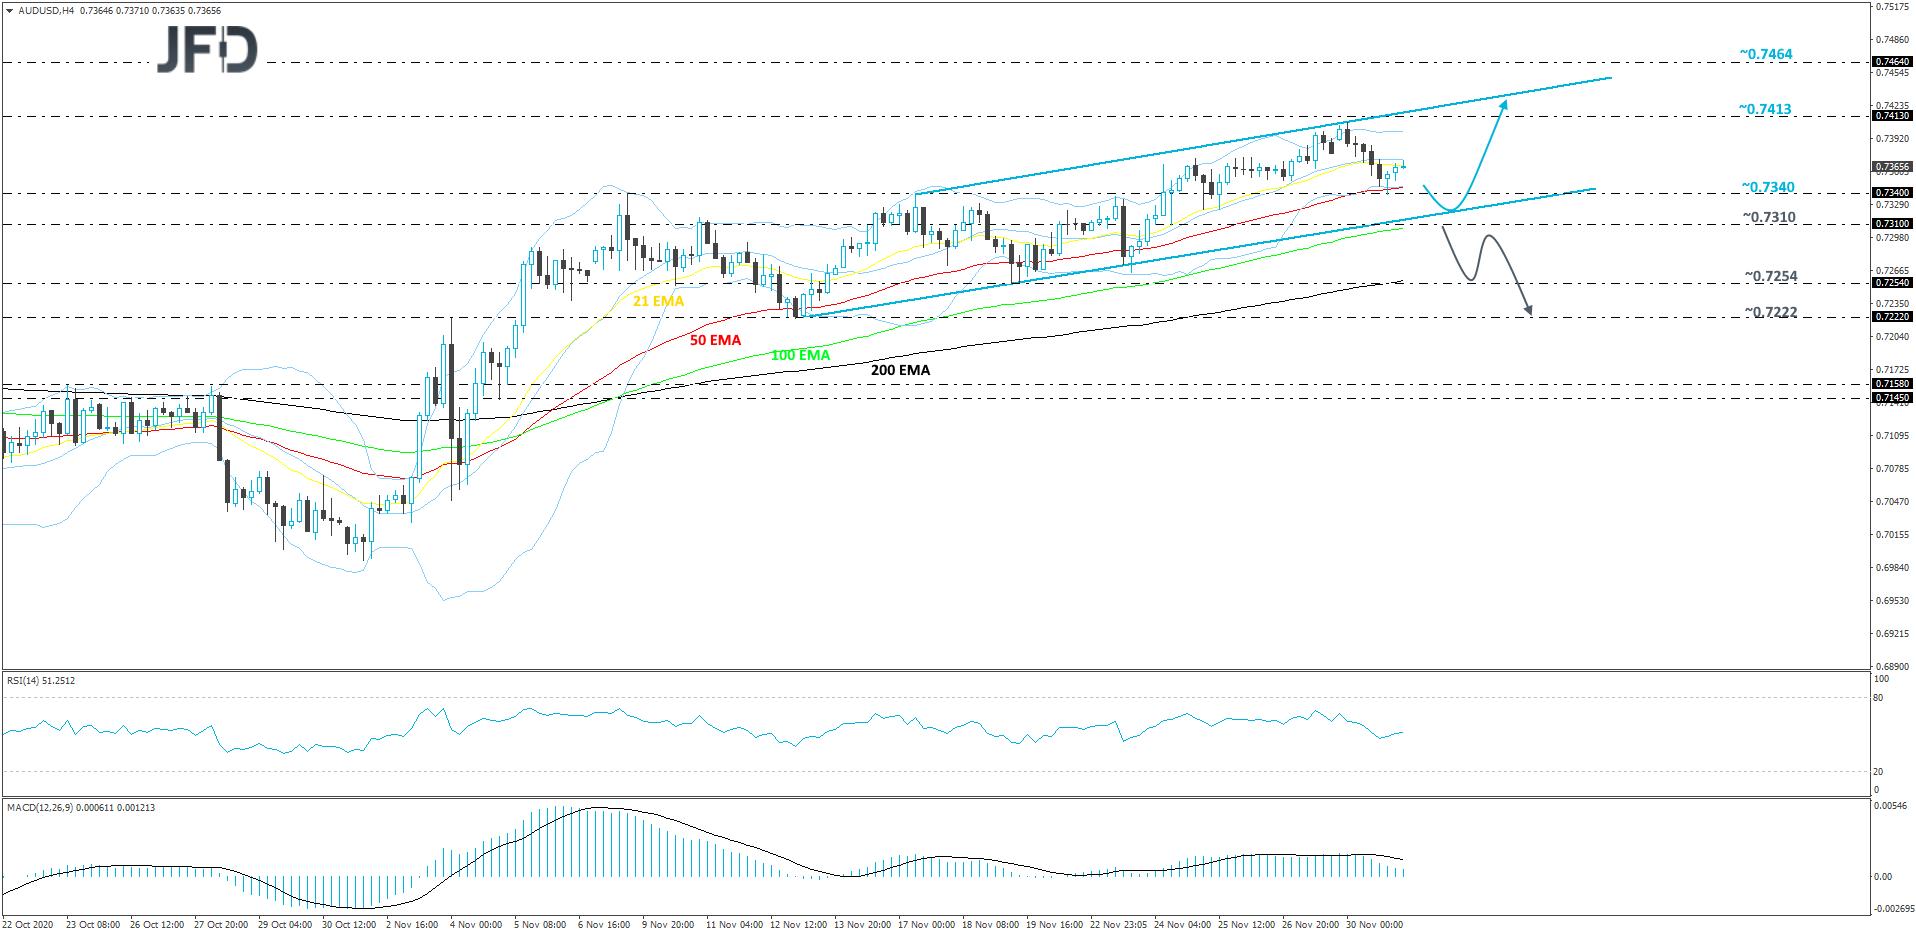 AUD/USD 4-hour chart technical analysis